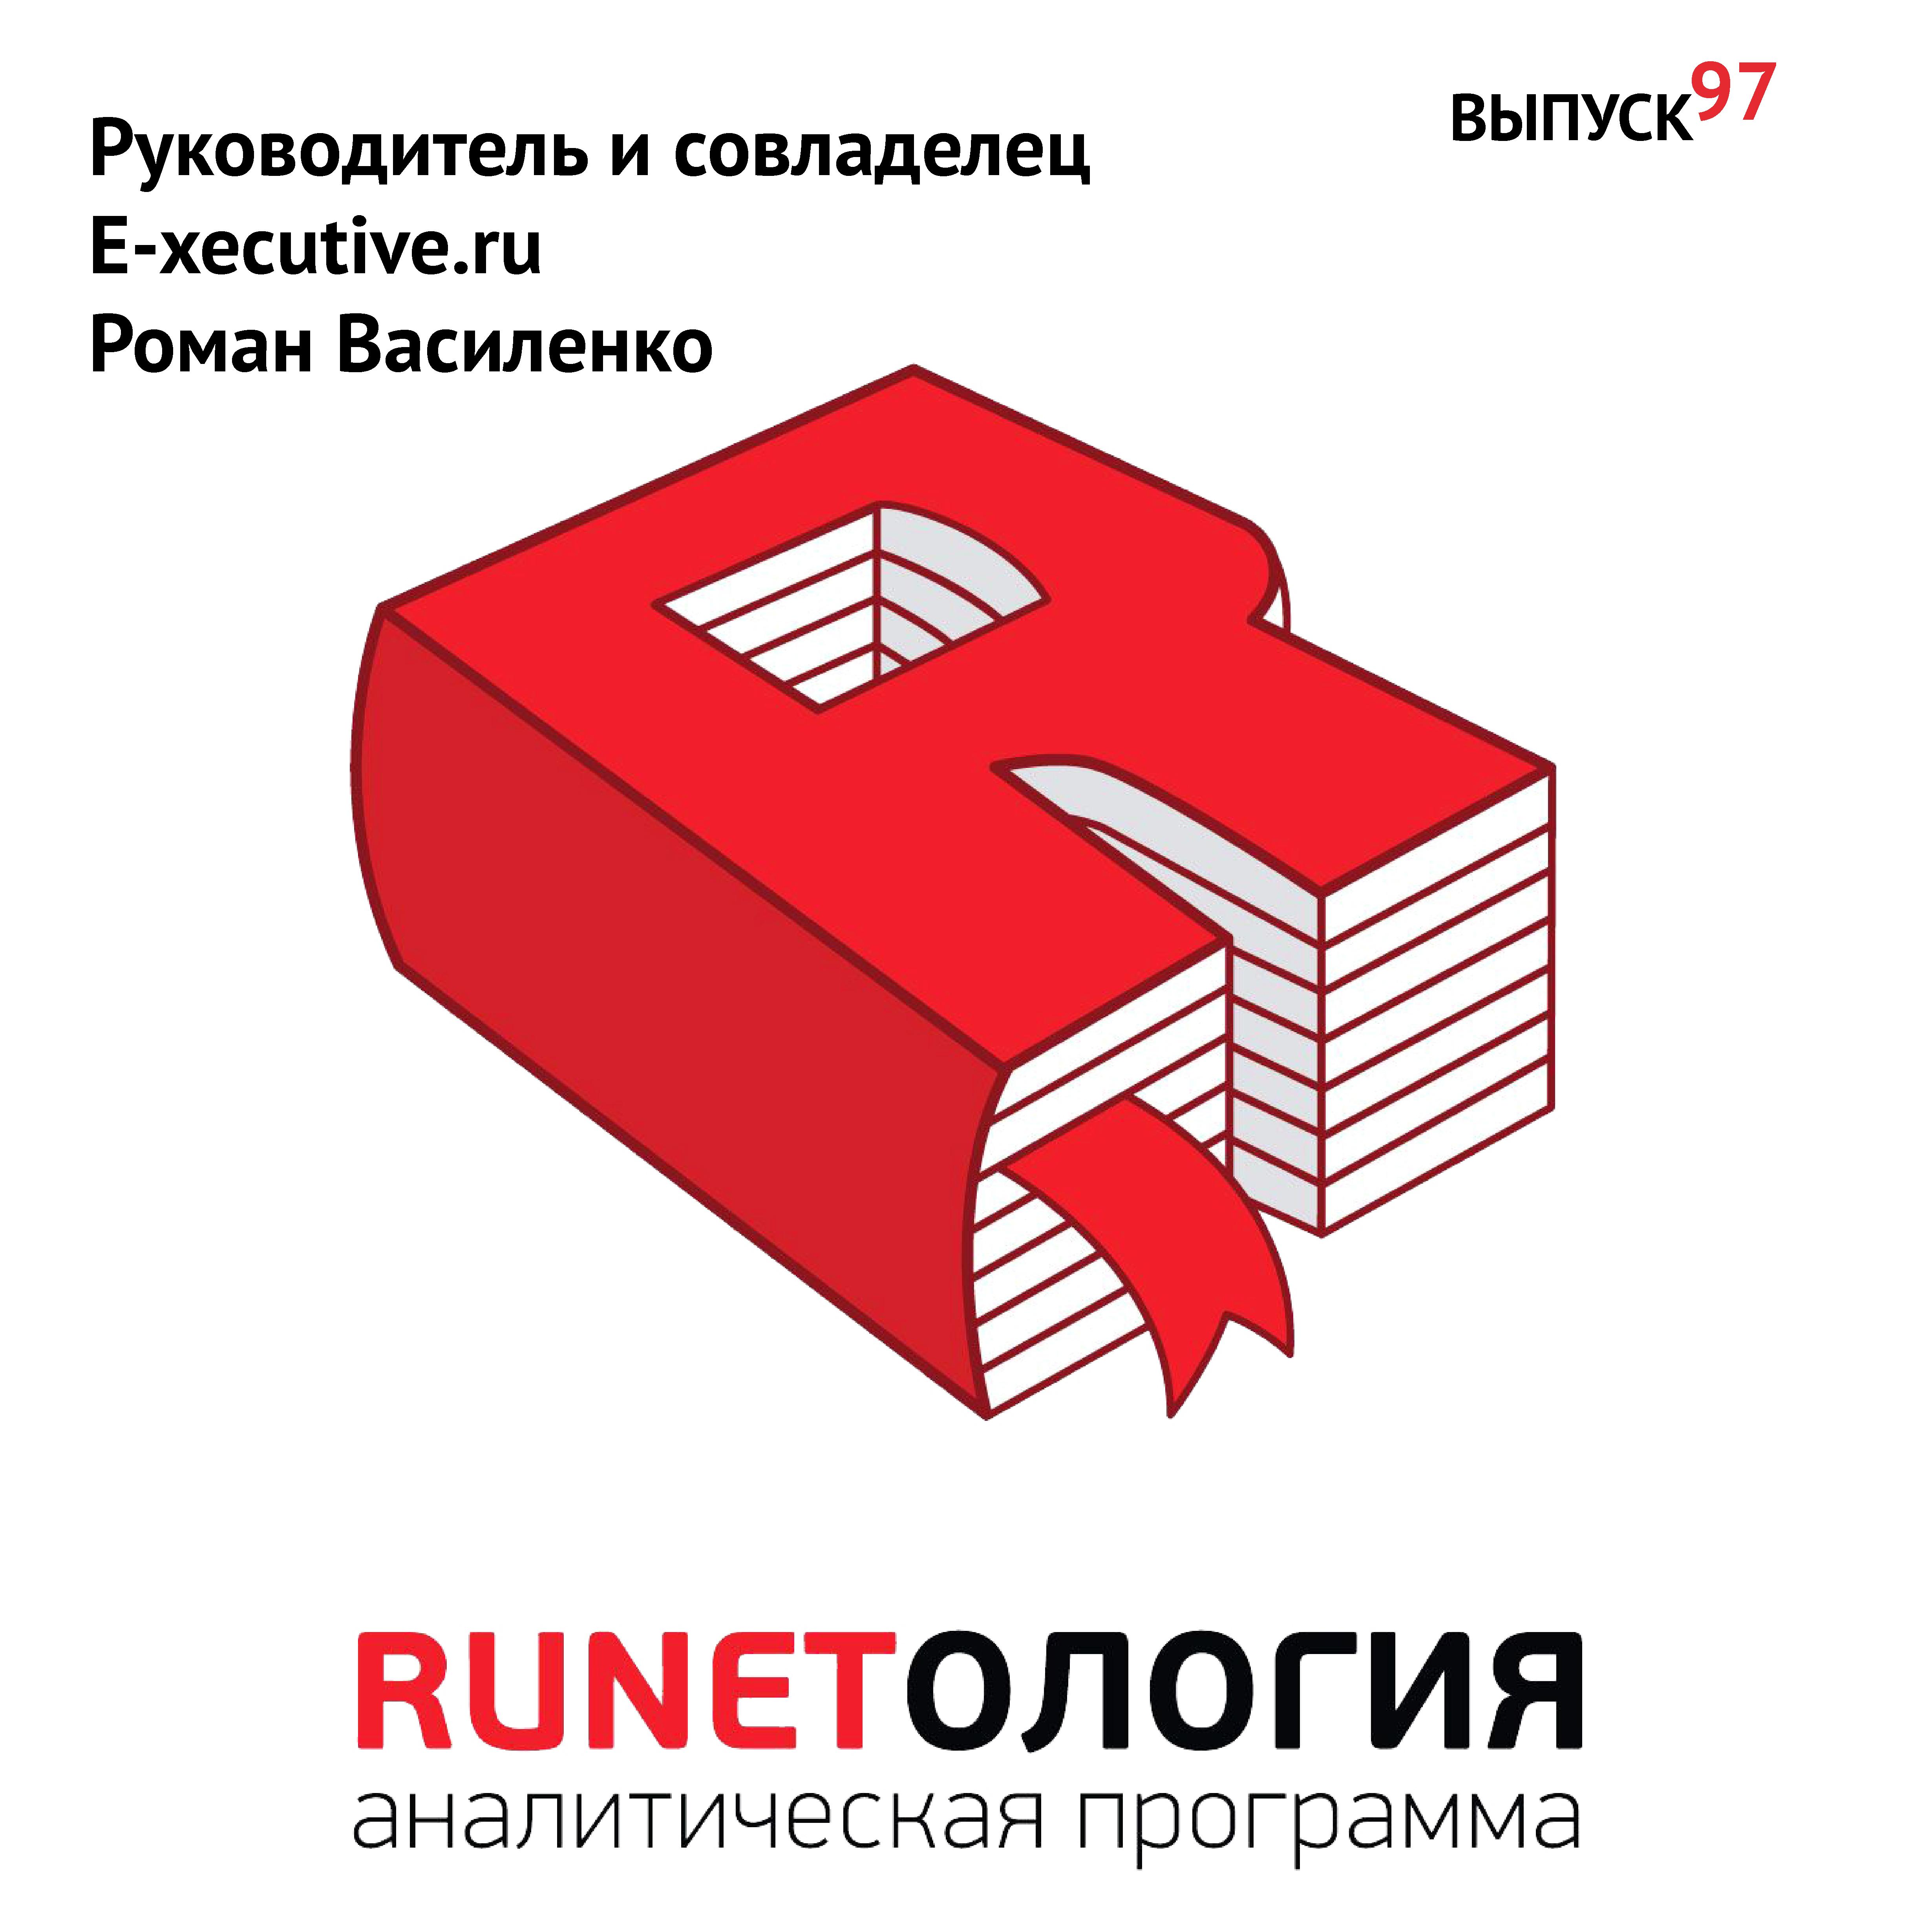 Максим Спиридонов Руководитель и совладелец E-xecutive.ru Роман Василенко цены онлайн